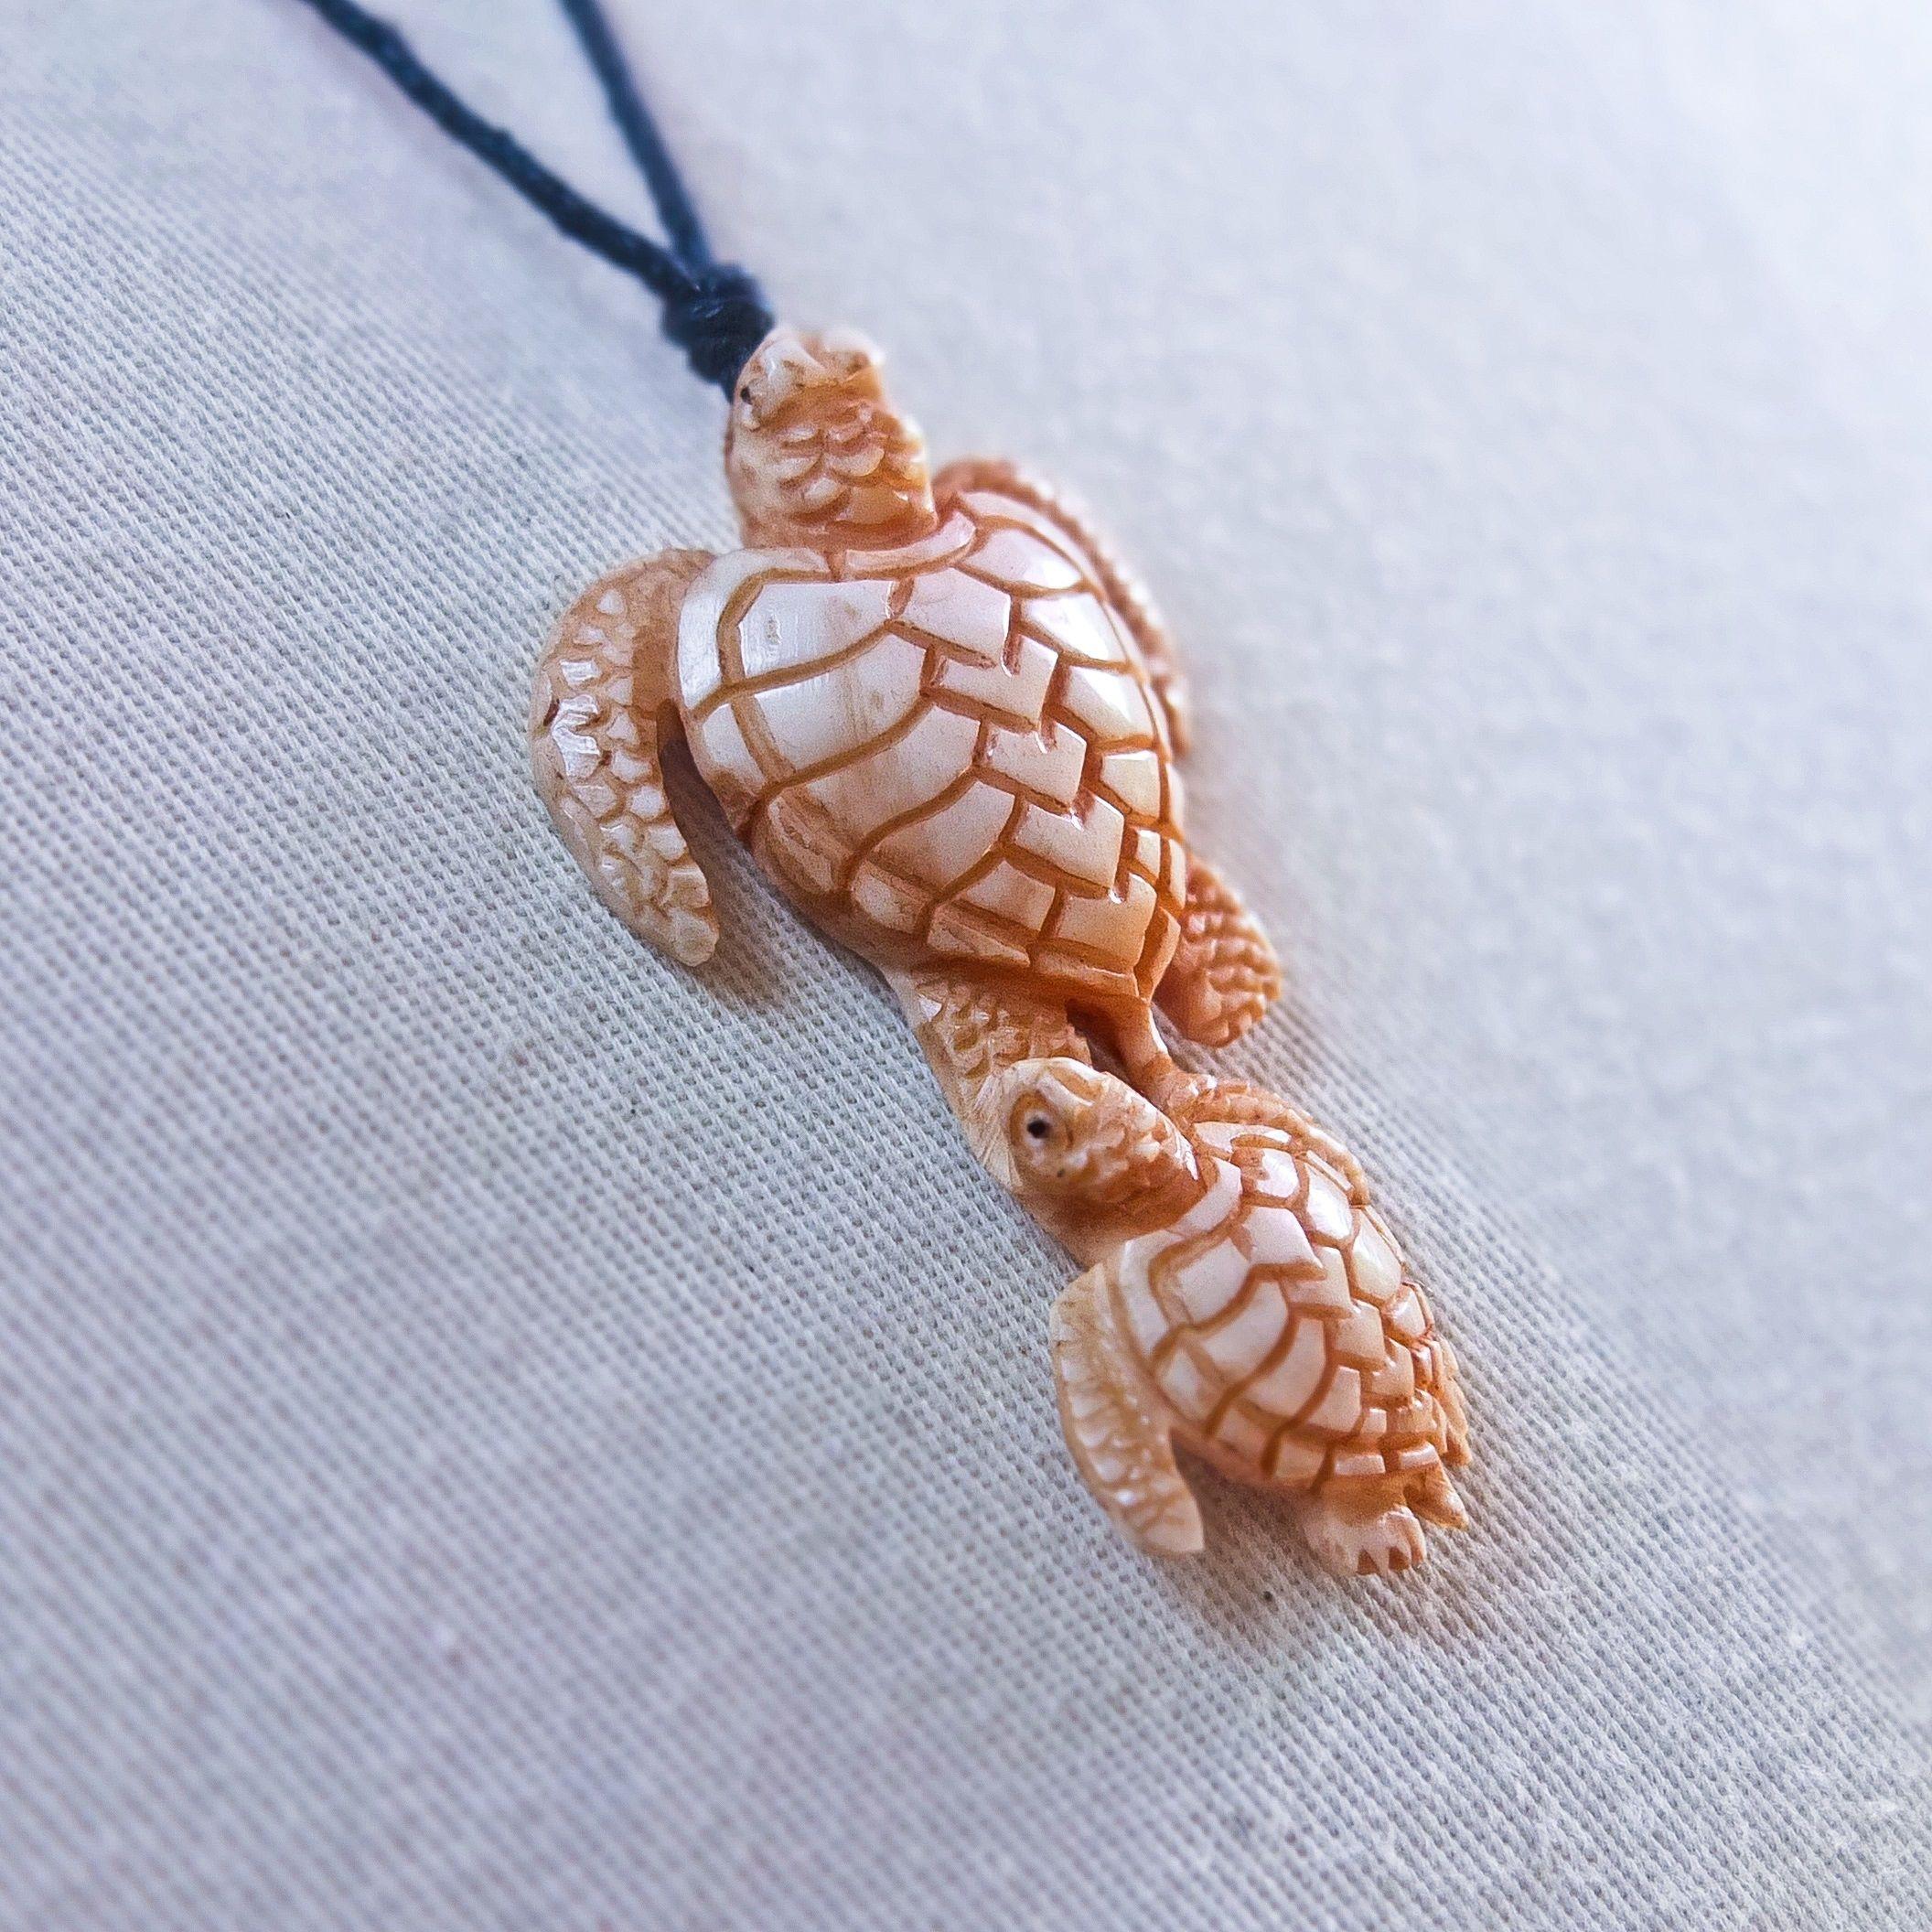 Carved Turtle Necklace Animal Pendant Buffalo Bone Jewelry Taxidermy Steer Bull Turtle Jewelry Antler Jewelry Animal Jewelry